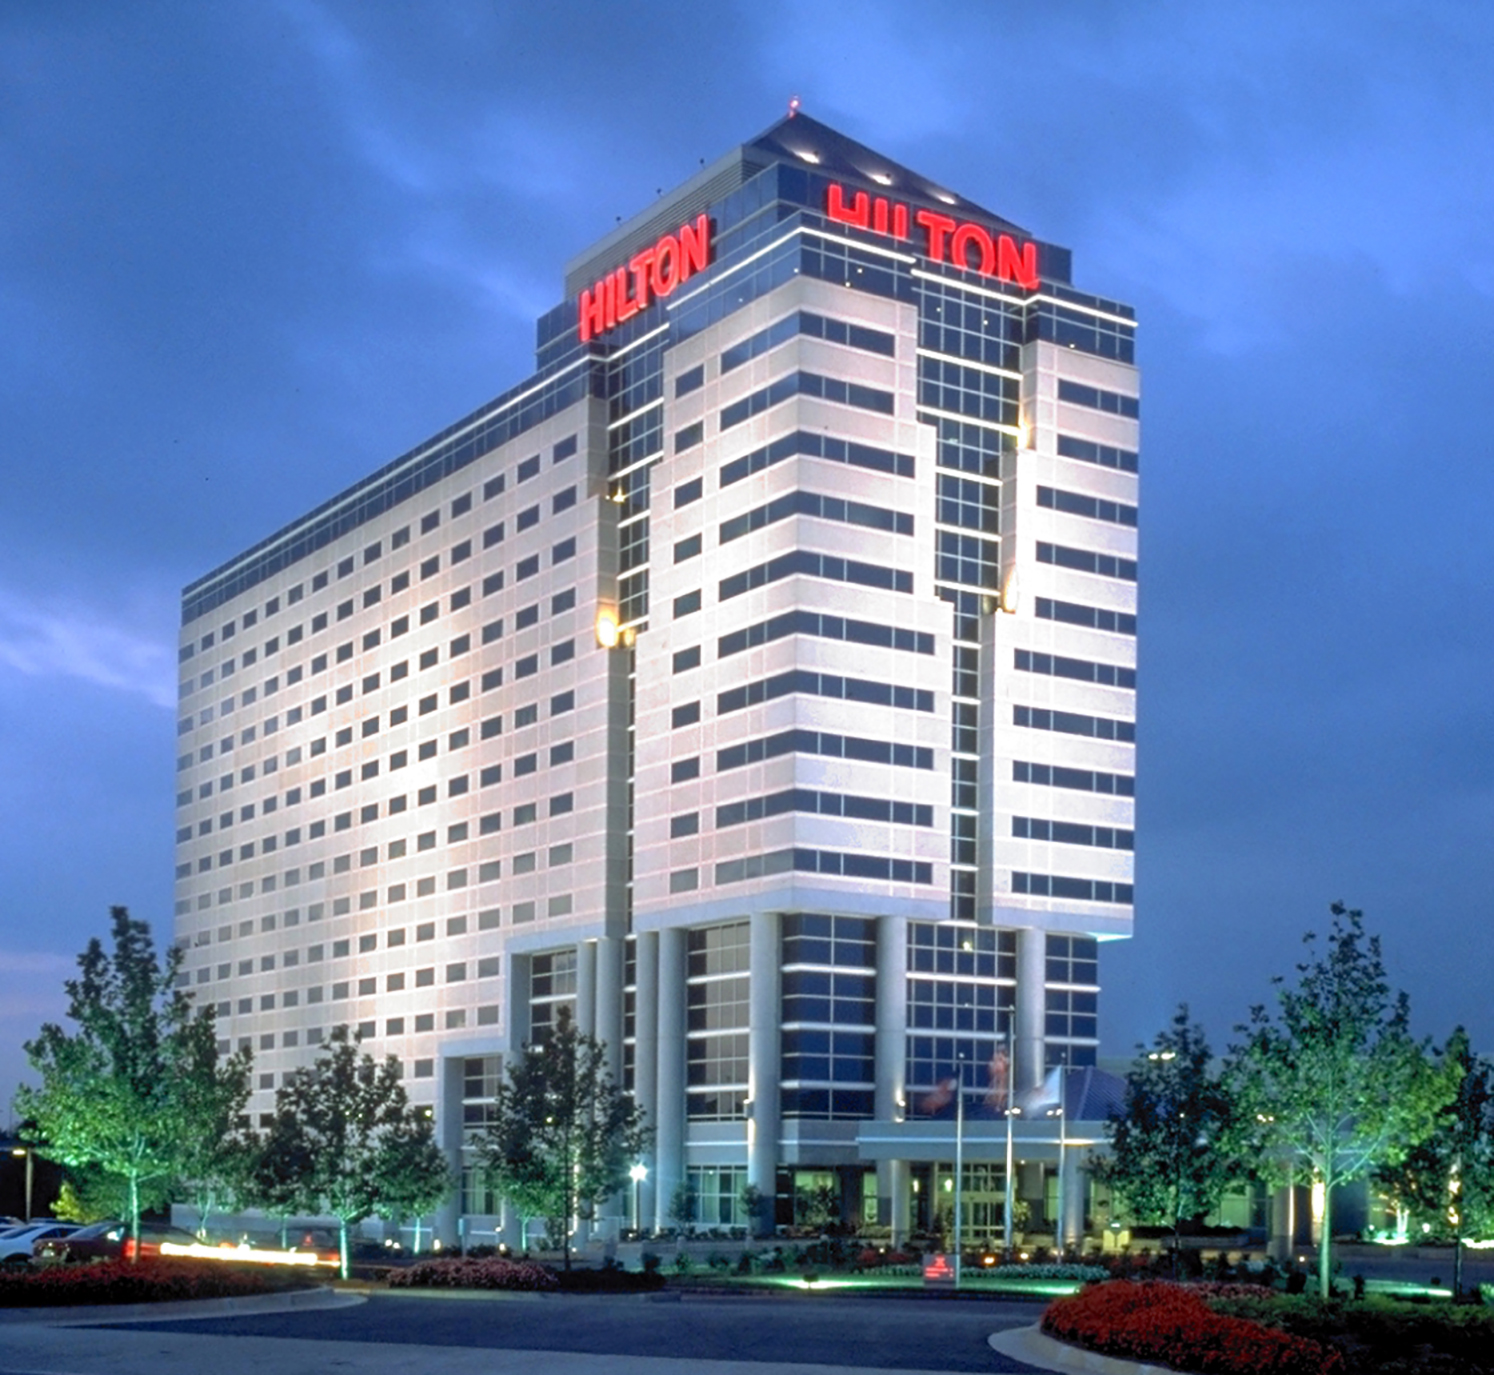 Atlanta Airport Hilton